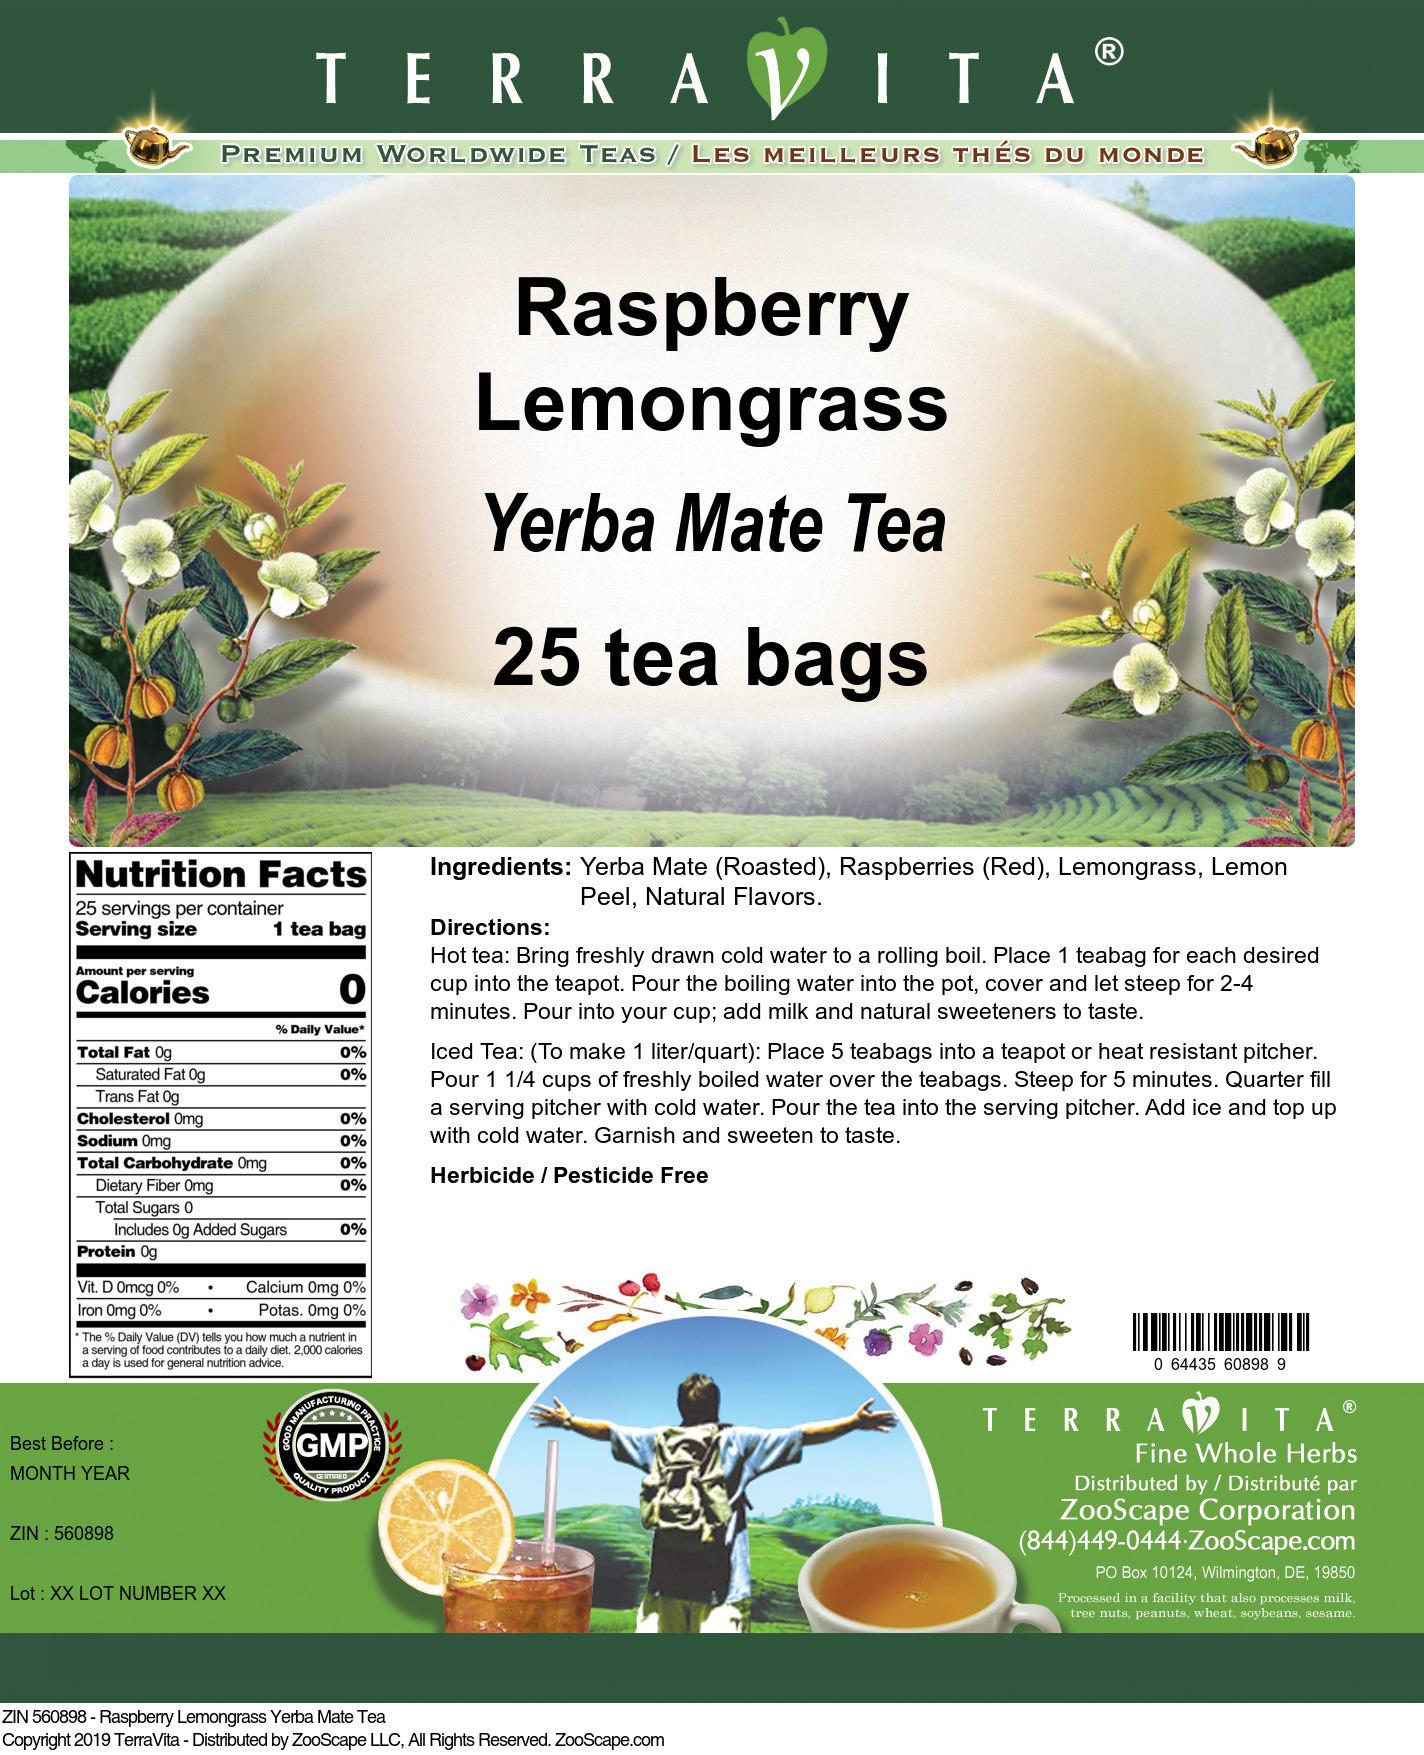 Raspberry Lemongrass Yerba Mate Tea